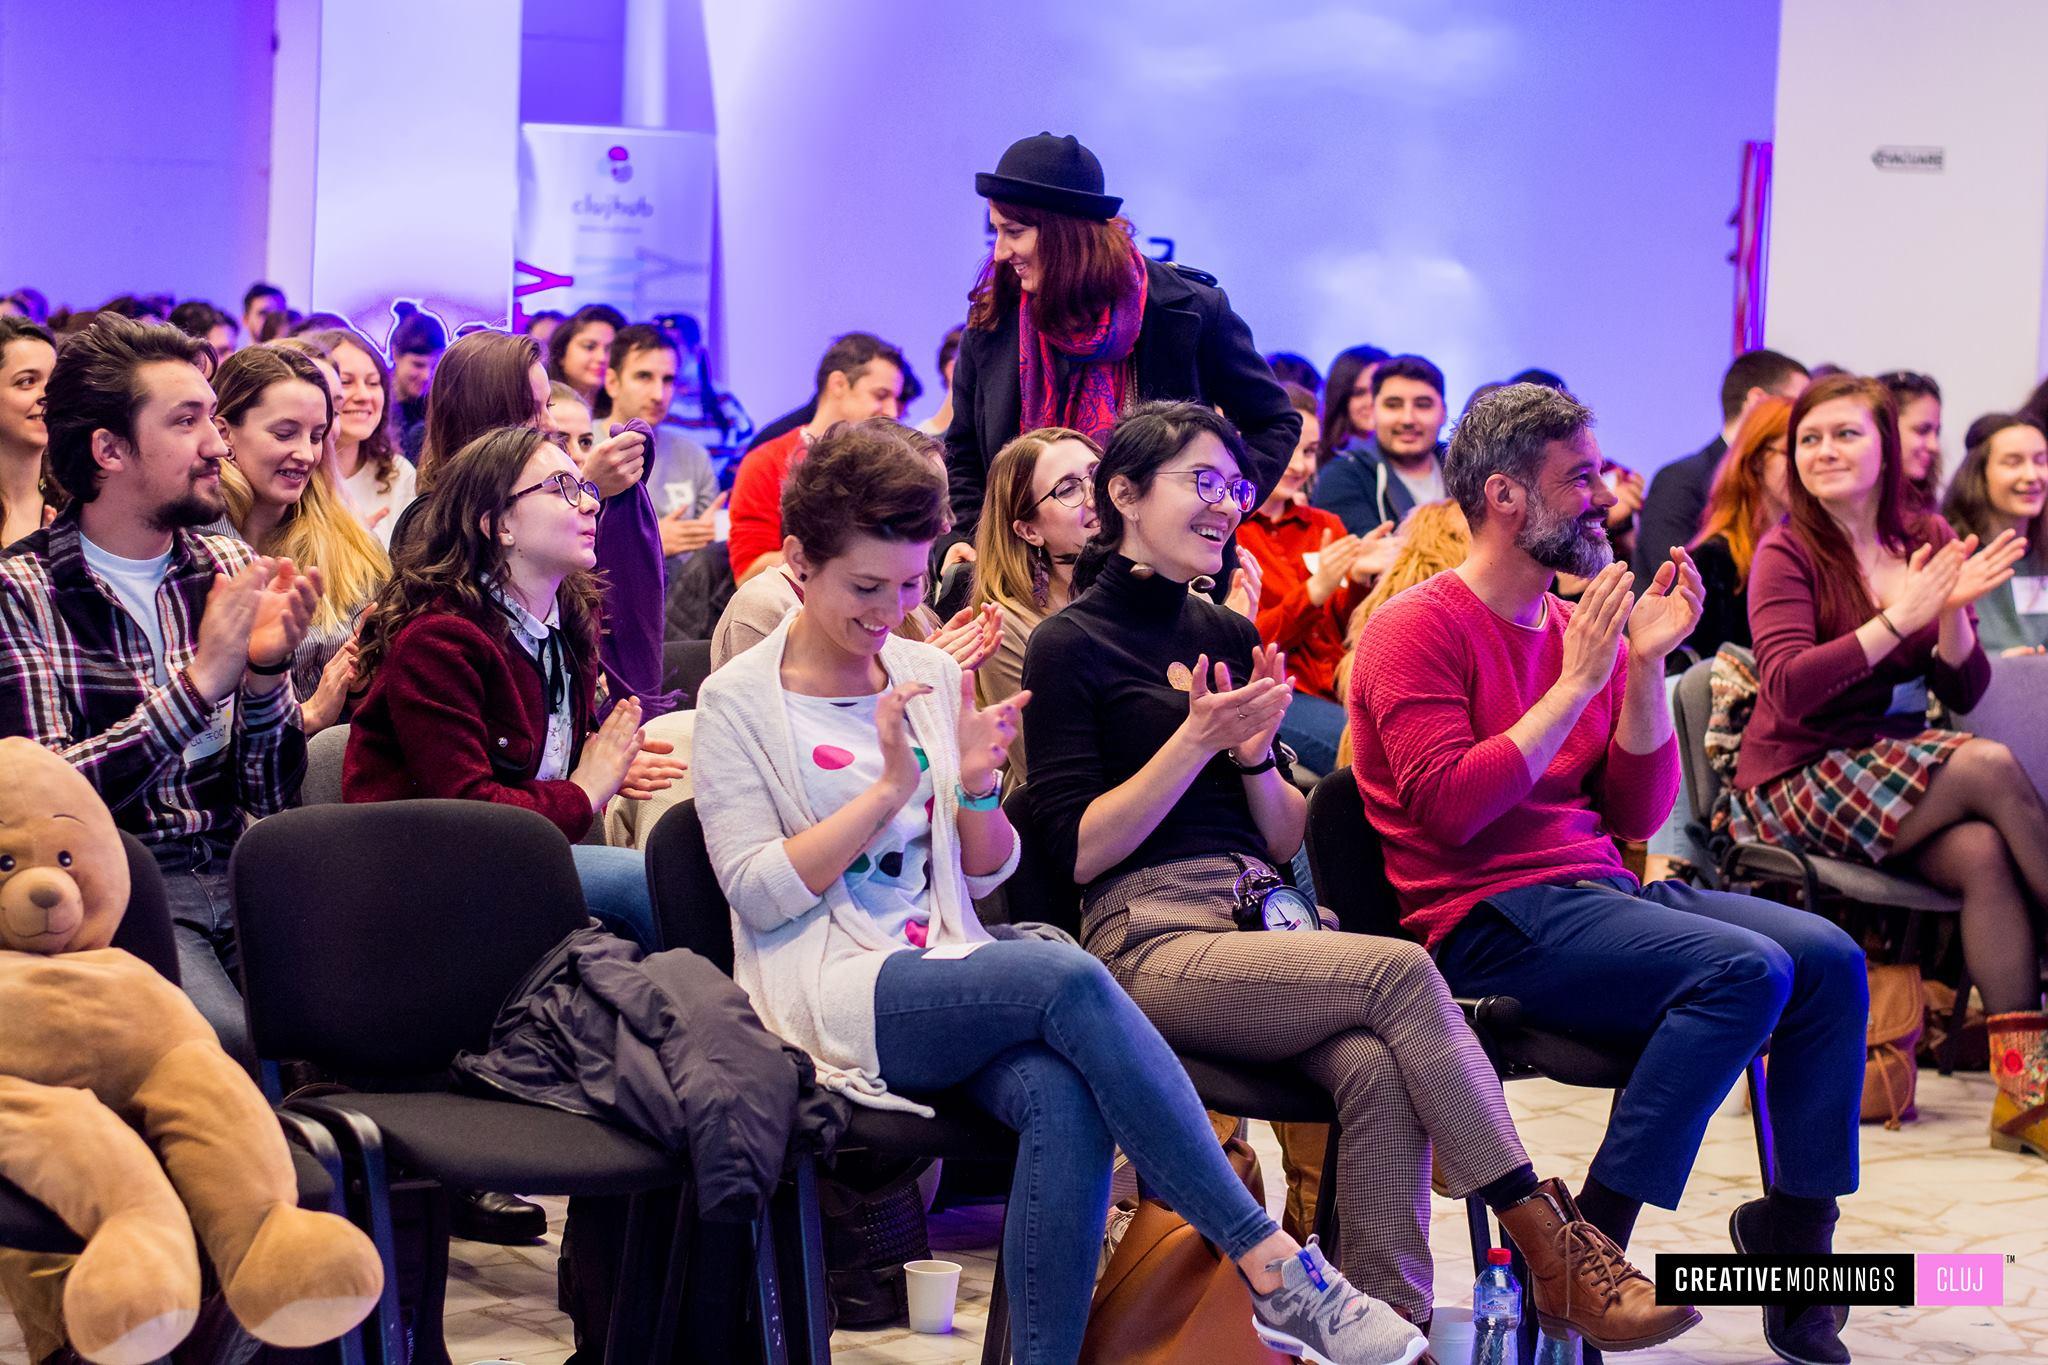 CreativeMornings Cluj on Inclusive with István Szakáts